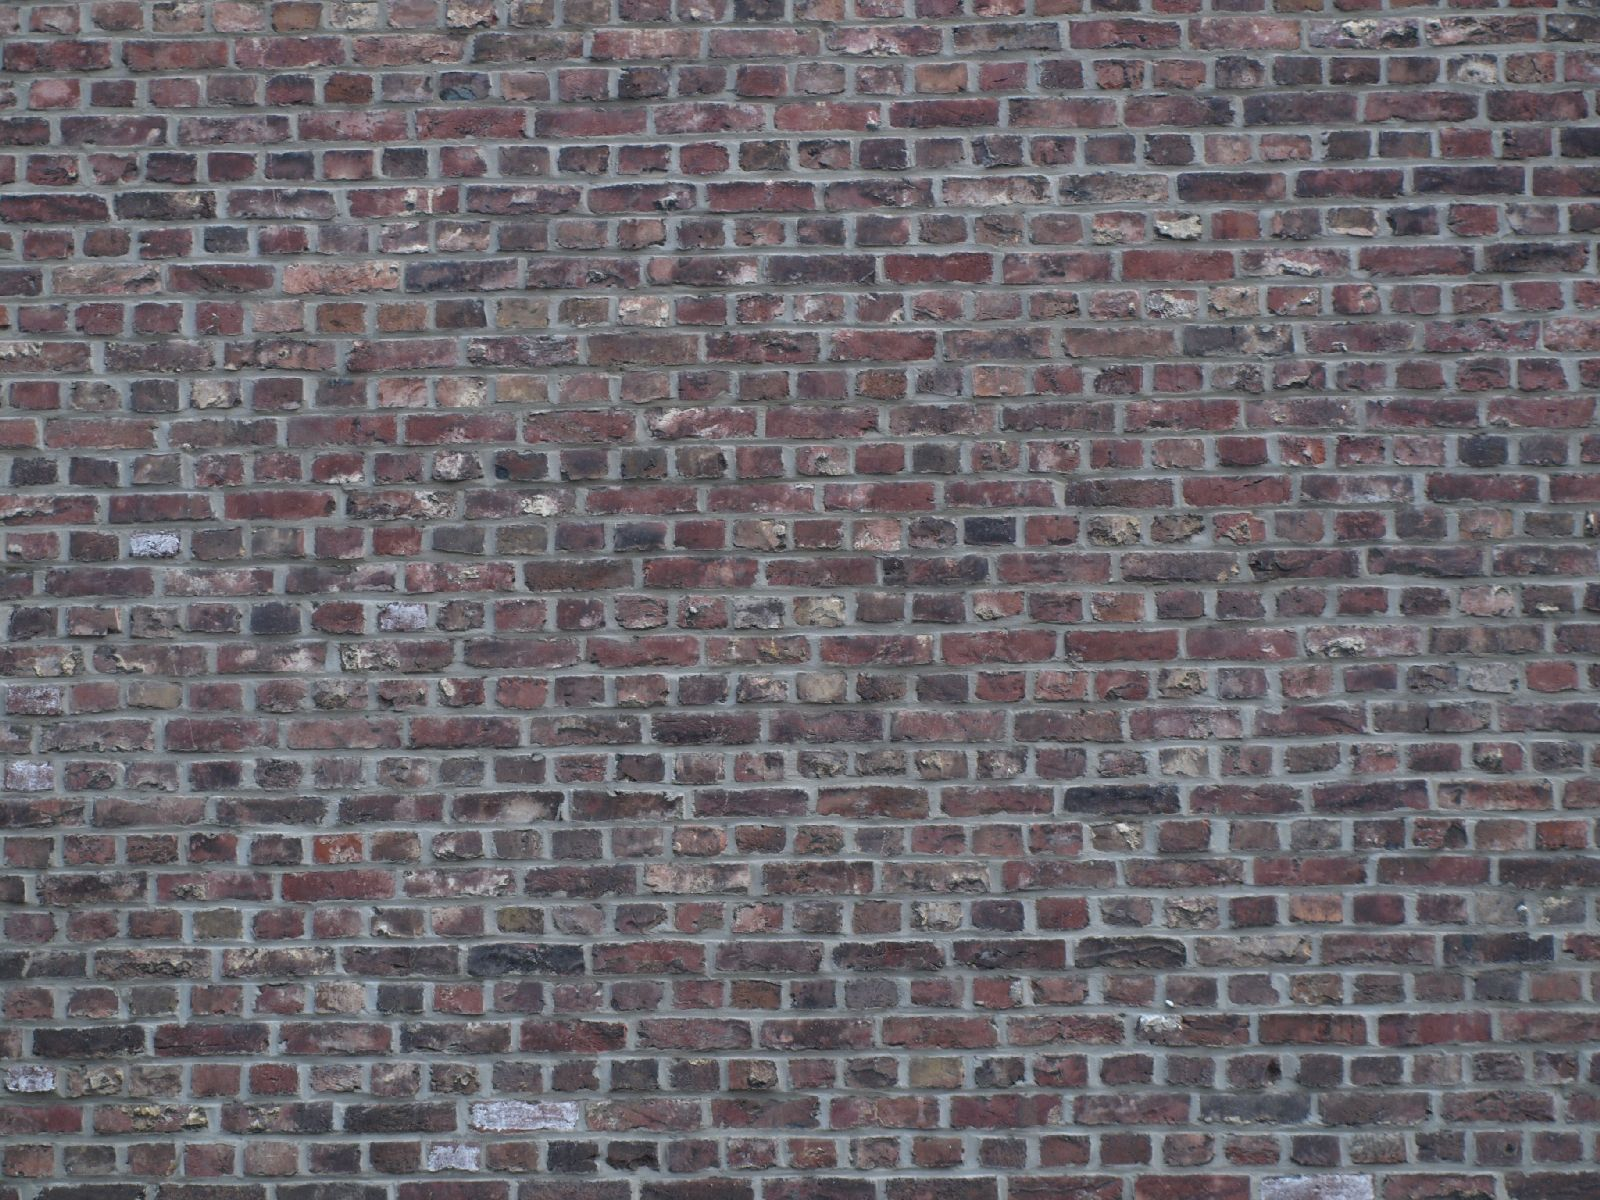 Wand-Mauerwerk-Backstein_Textur_A_P1249880